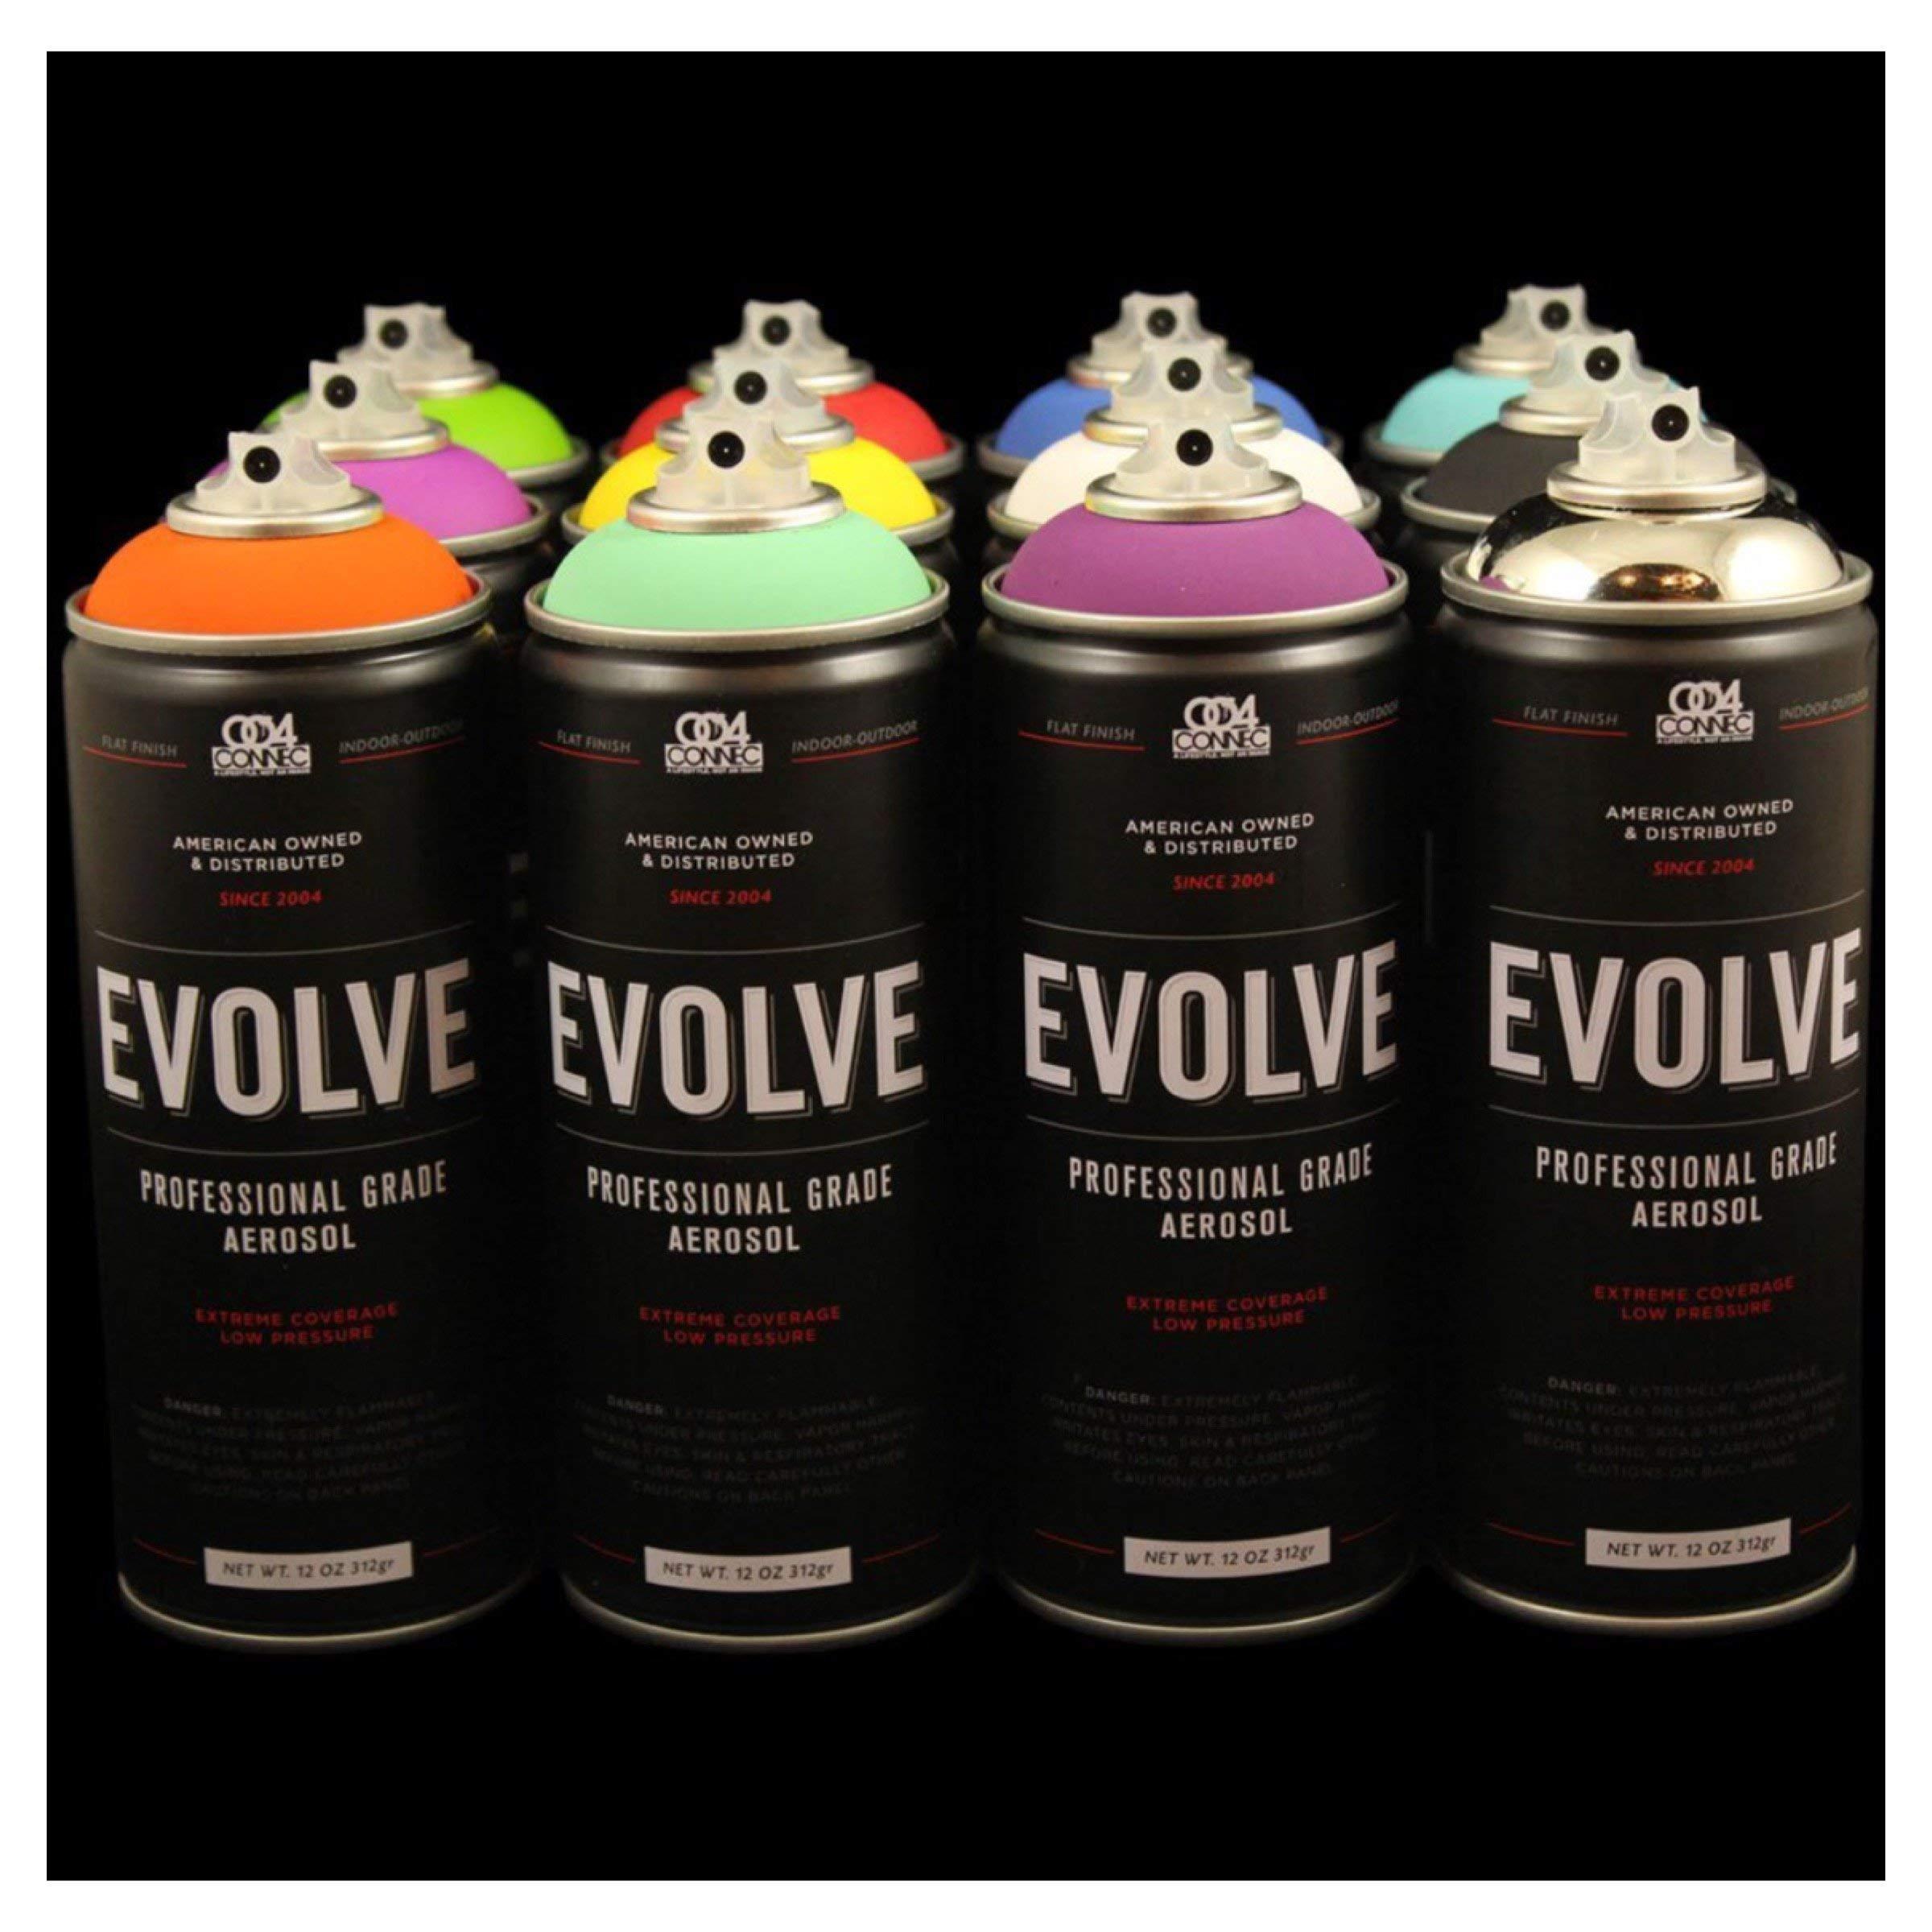 Evolve 12 pack, MTN, Montana, Belton & Molotow & Ironlak Spray Paint by Evolve